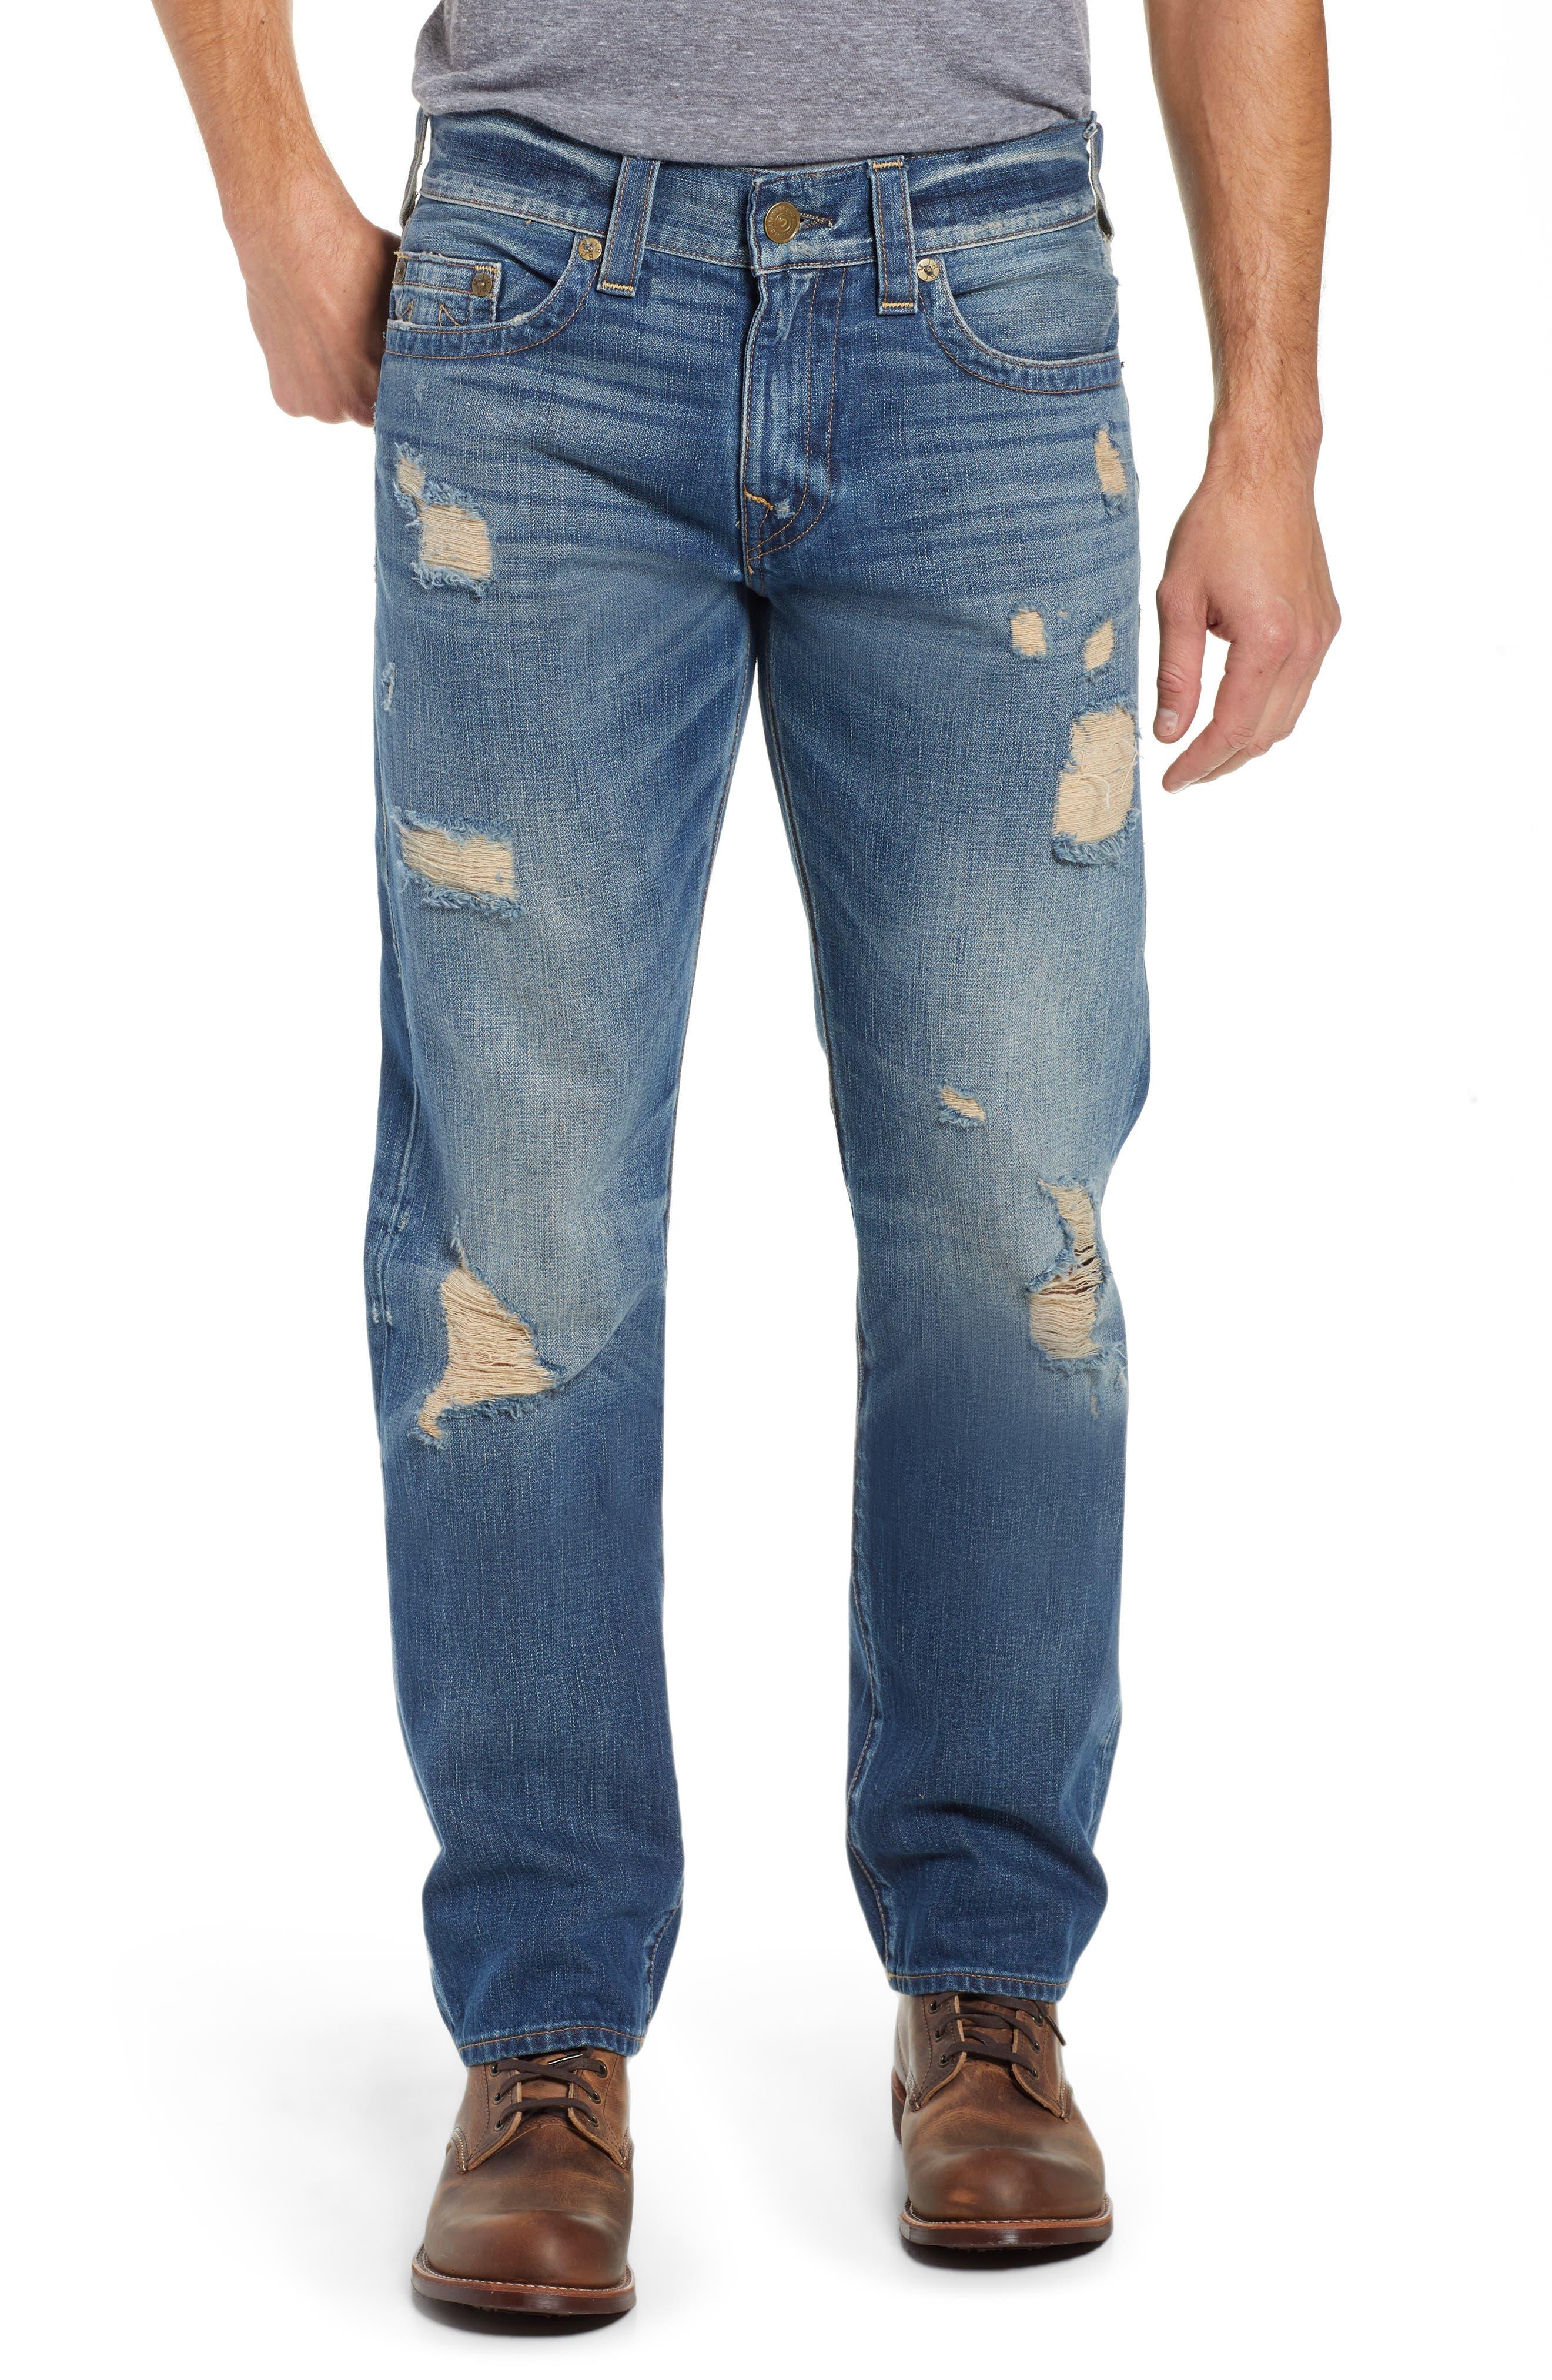 TRUE RELIGION BRAND JEANS,                             Geno Straight Leg Jeans,                             Main thumbnail 1, color,                             WORN REBEL